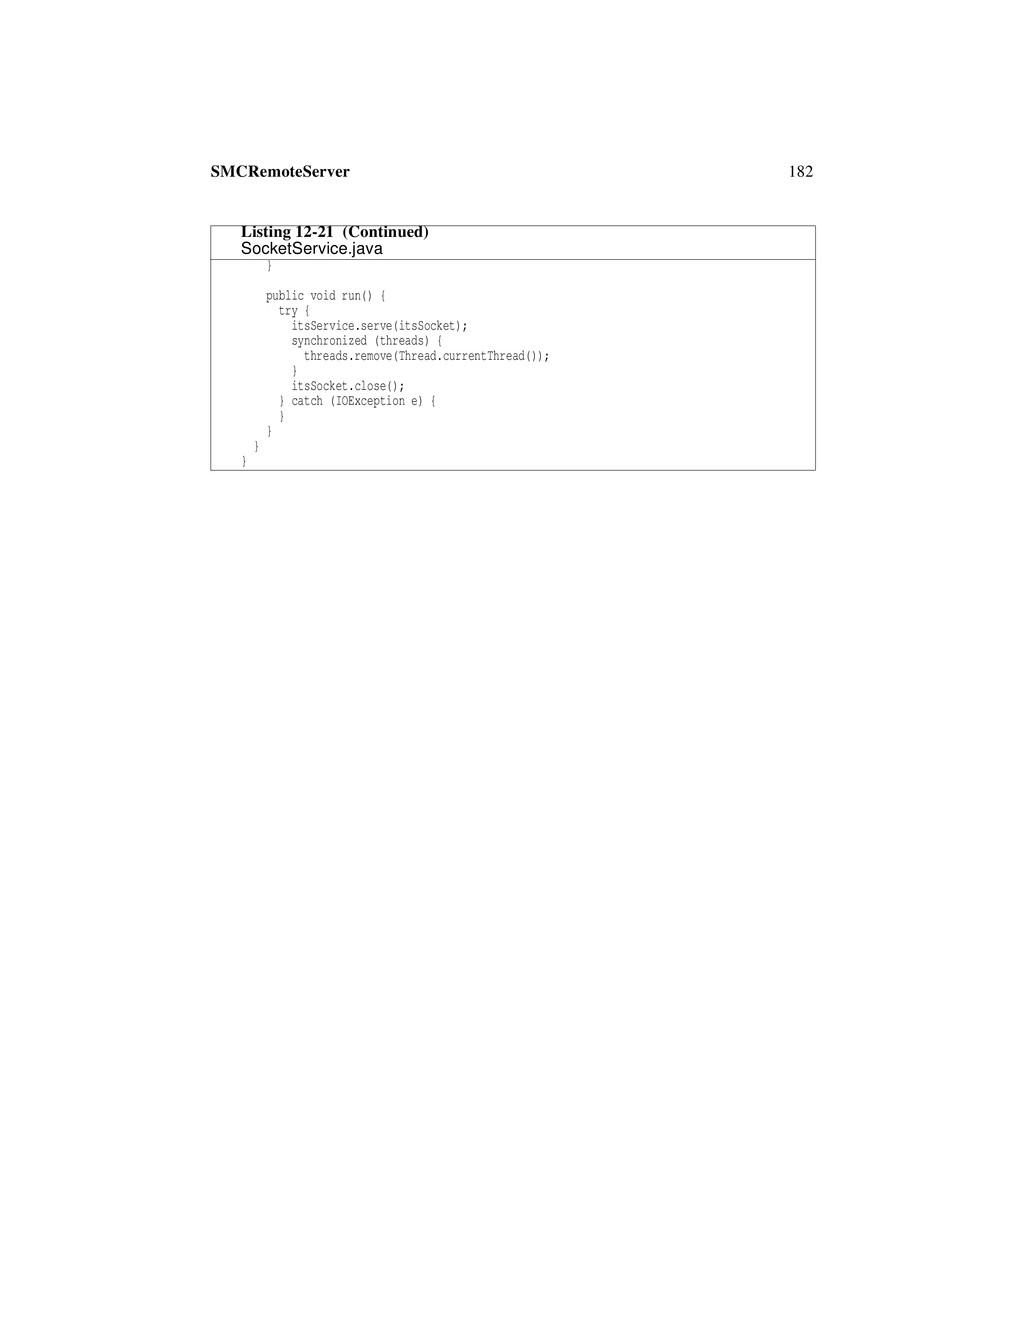 182 SMCRemoteServer } public void run() { try {...